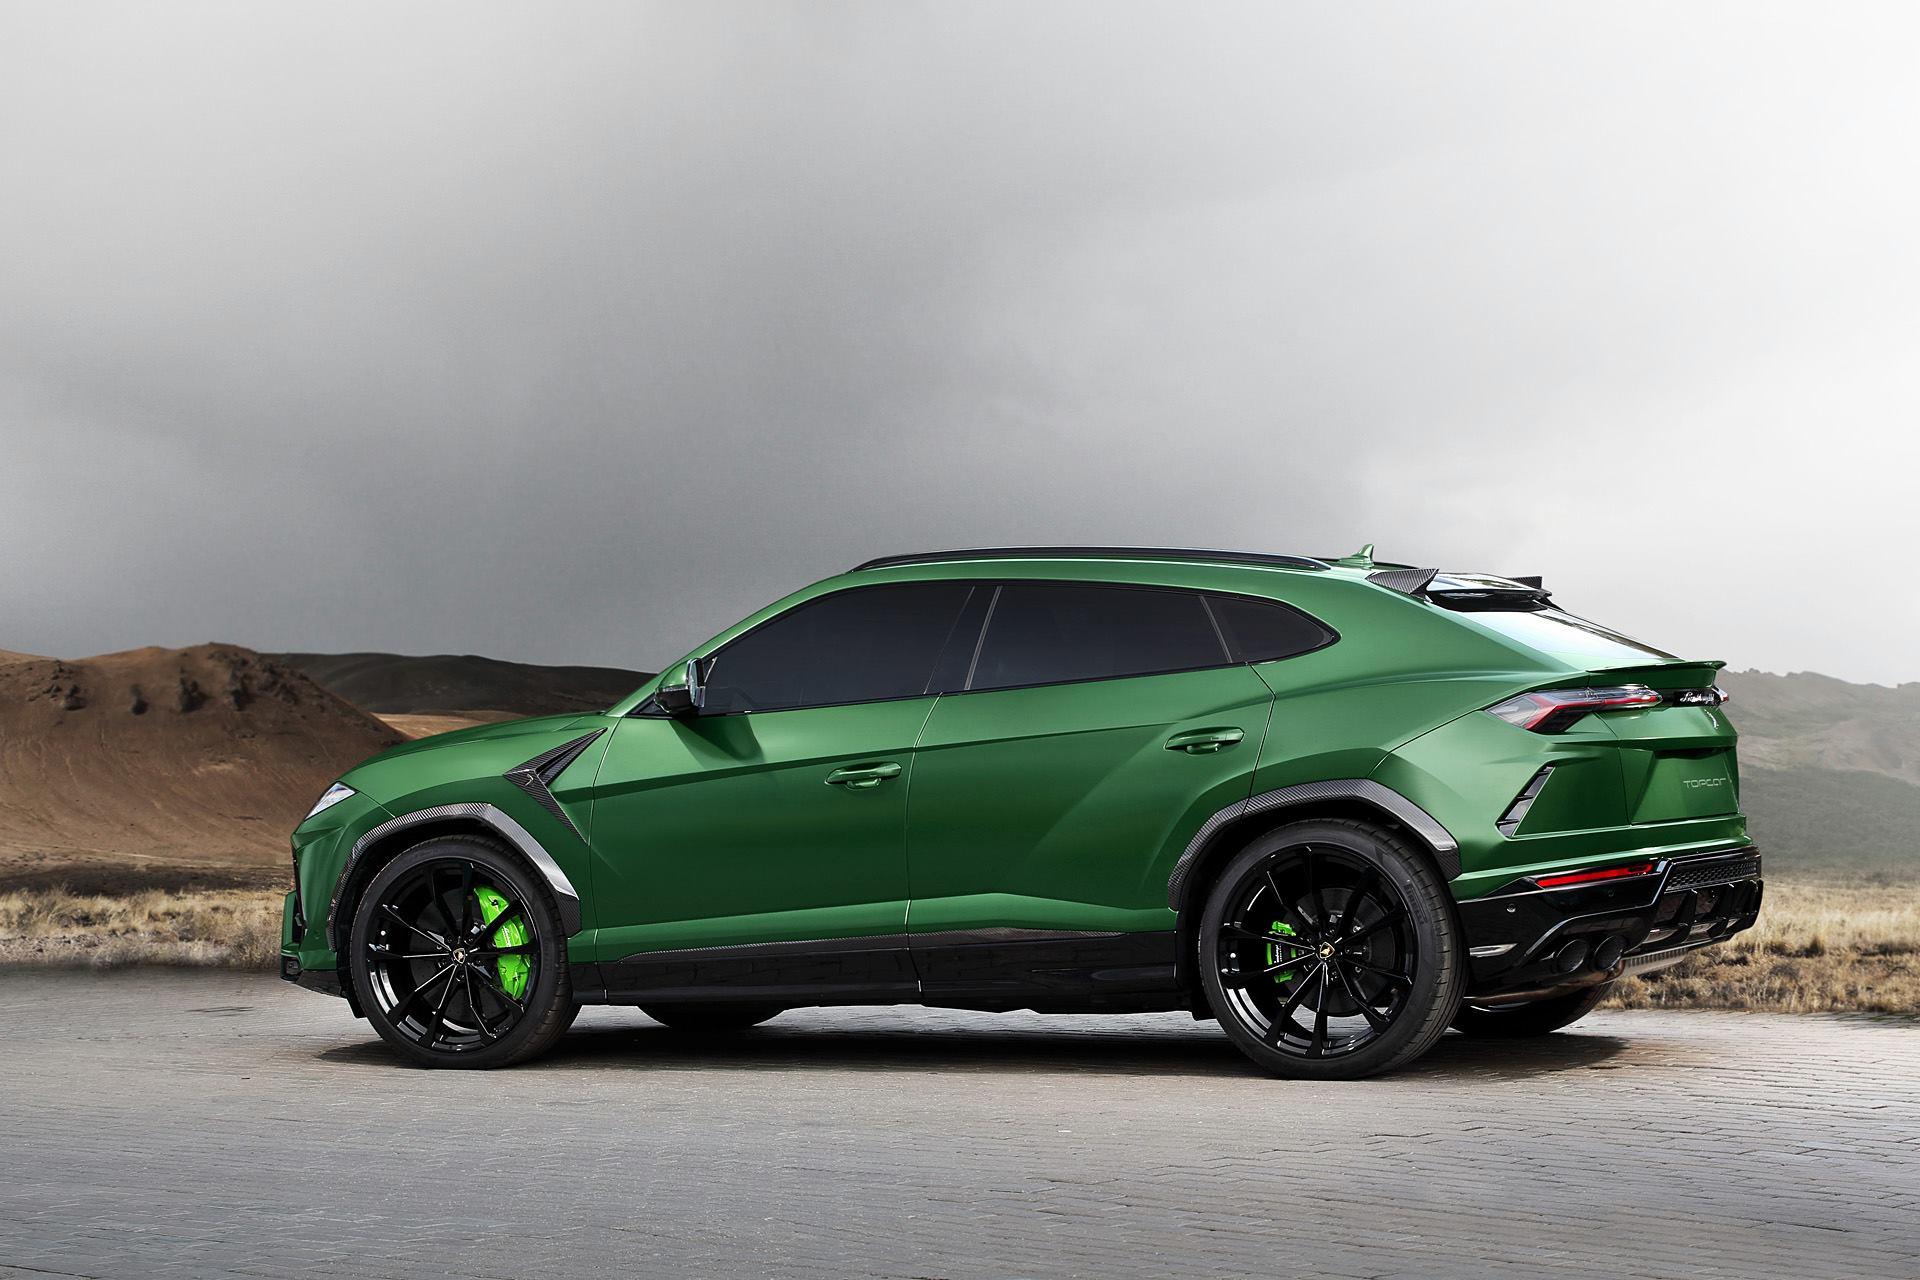 Military Green Lamborghini Urus Side View